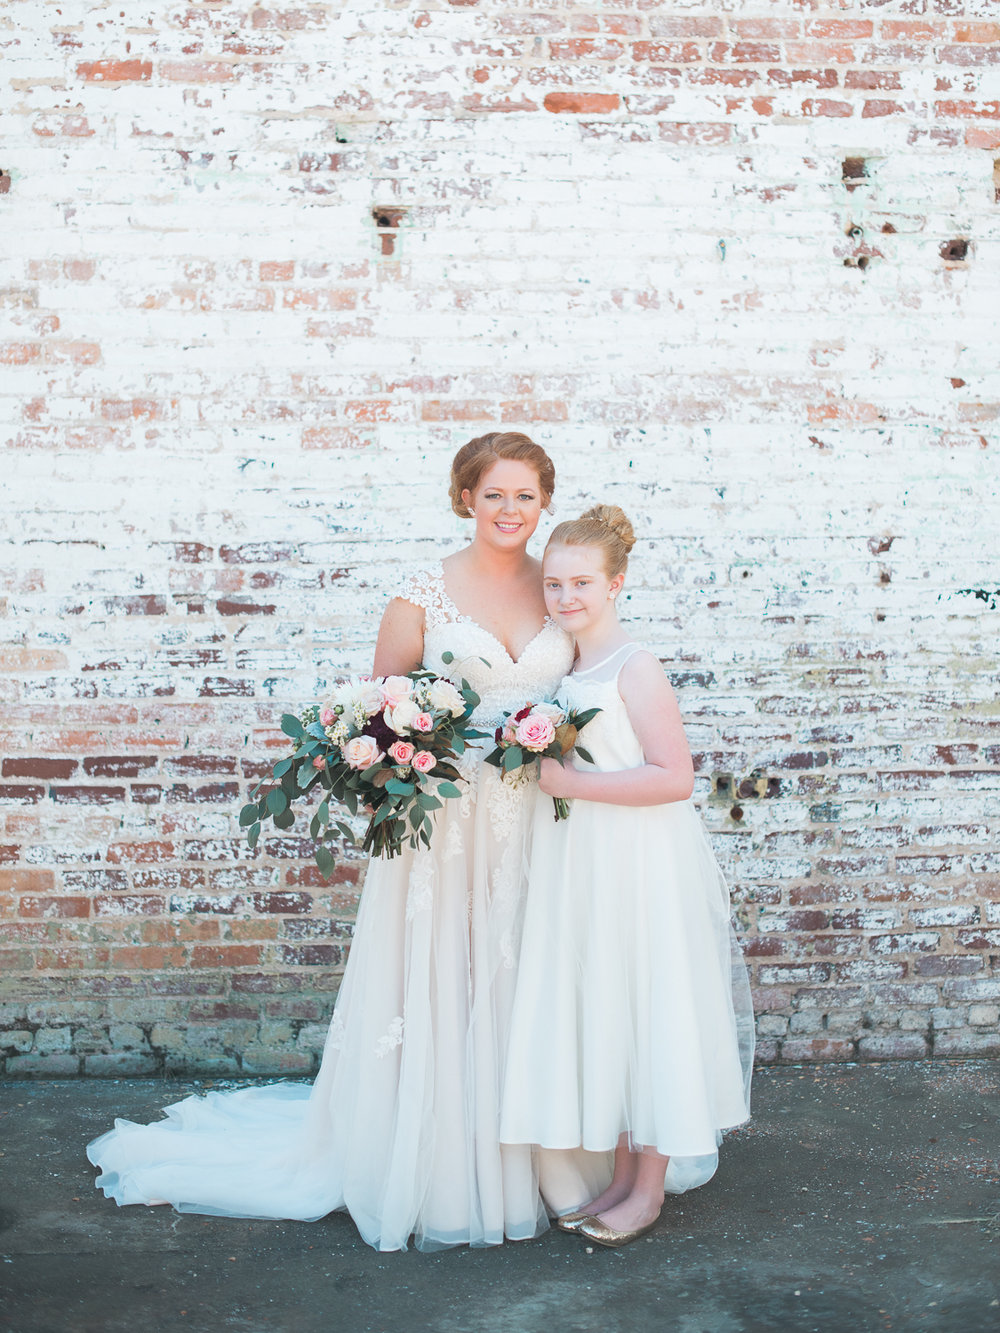 christinadavisphotography+realwedding+aprilfirst50.jpg